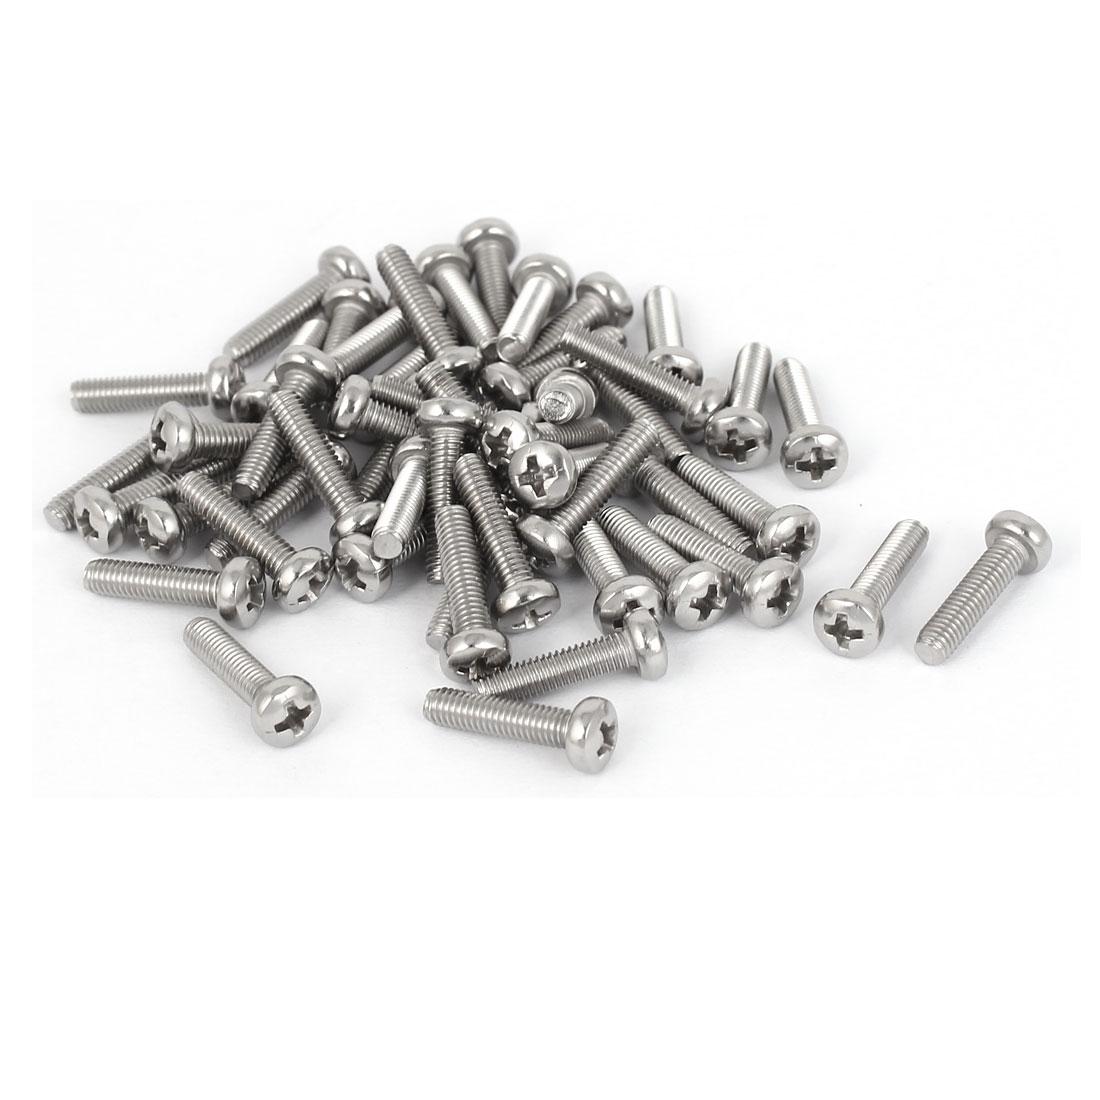 50 Pcs M3x12mm 316 Stainless Steel Metric Phillips Pan Head Machine Screws Bolts